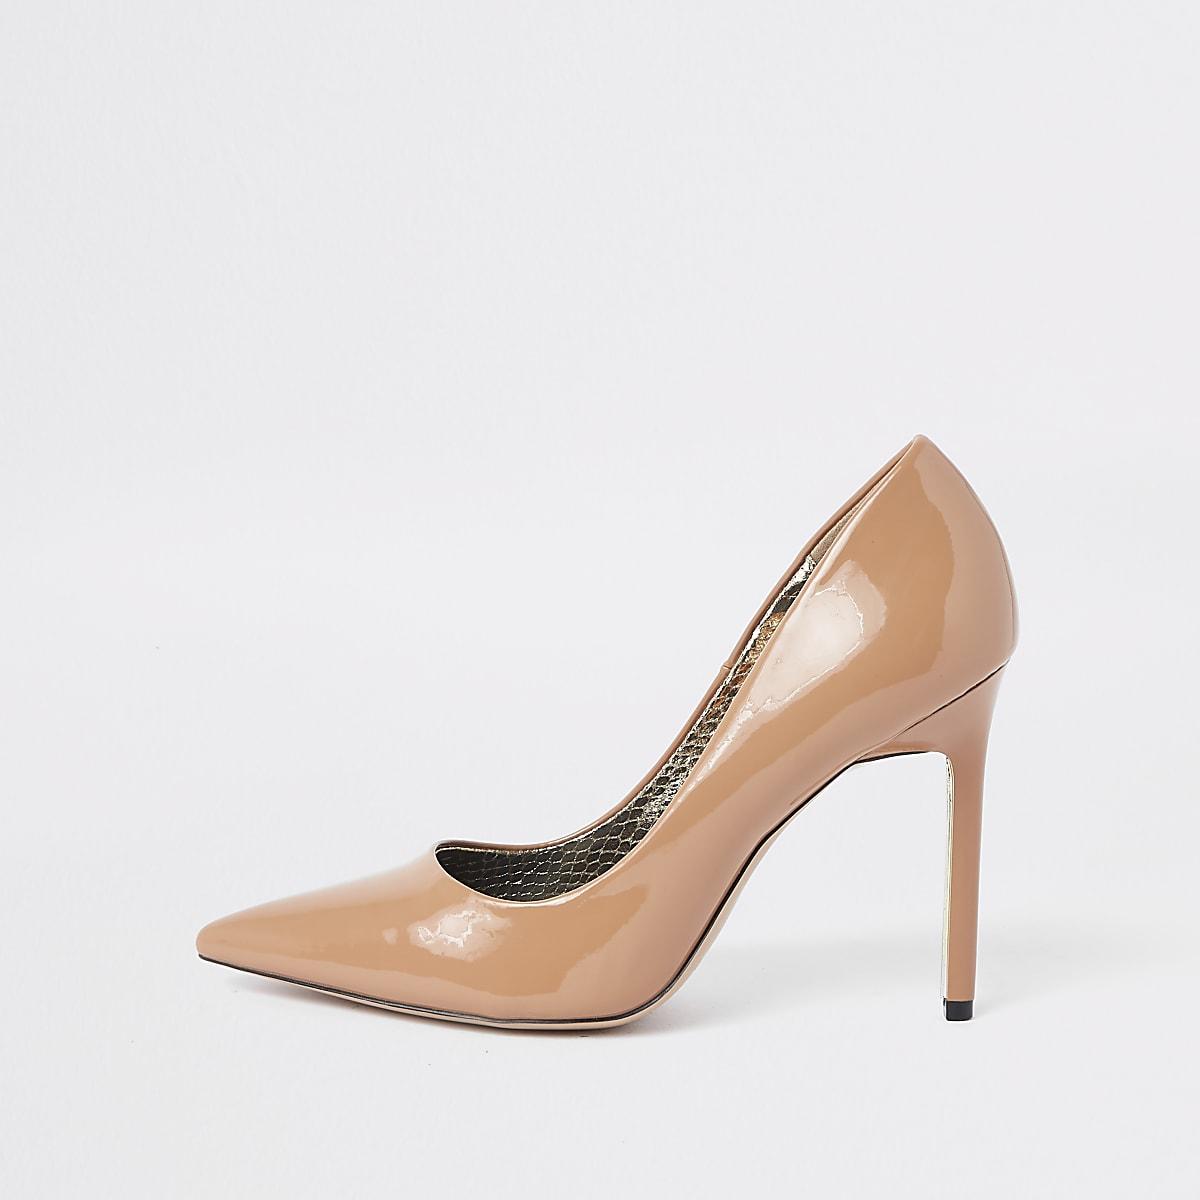 Femme Rose Bottes Chaussuresamp; Escarpins Clair Vernis rtQdCshx